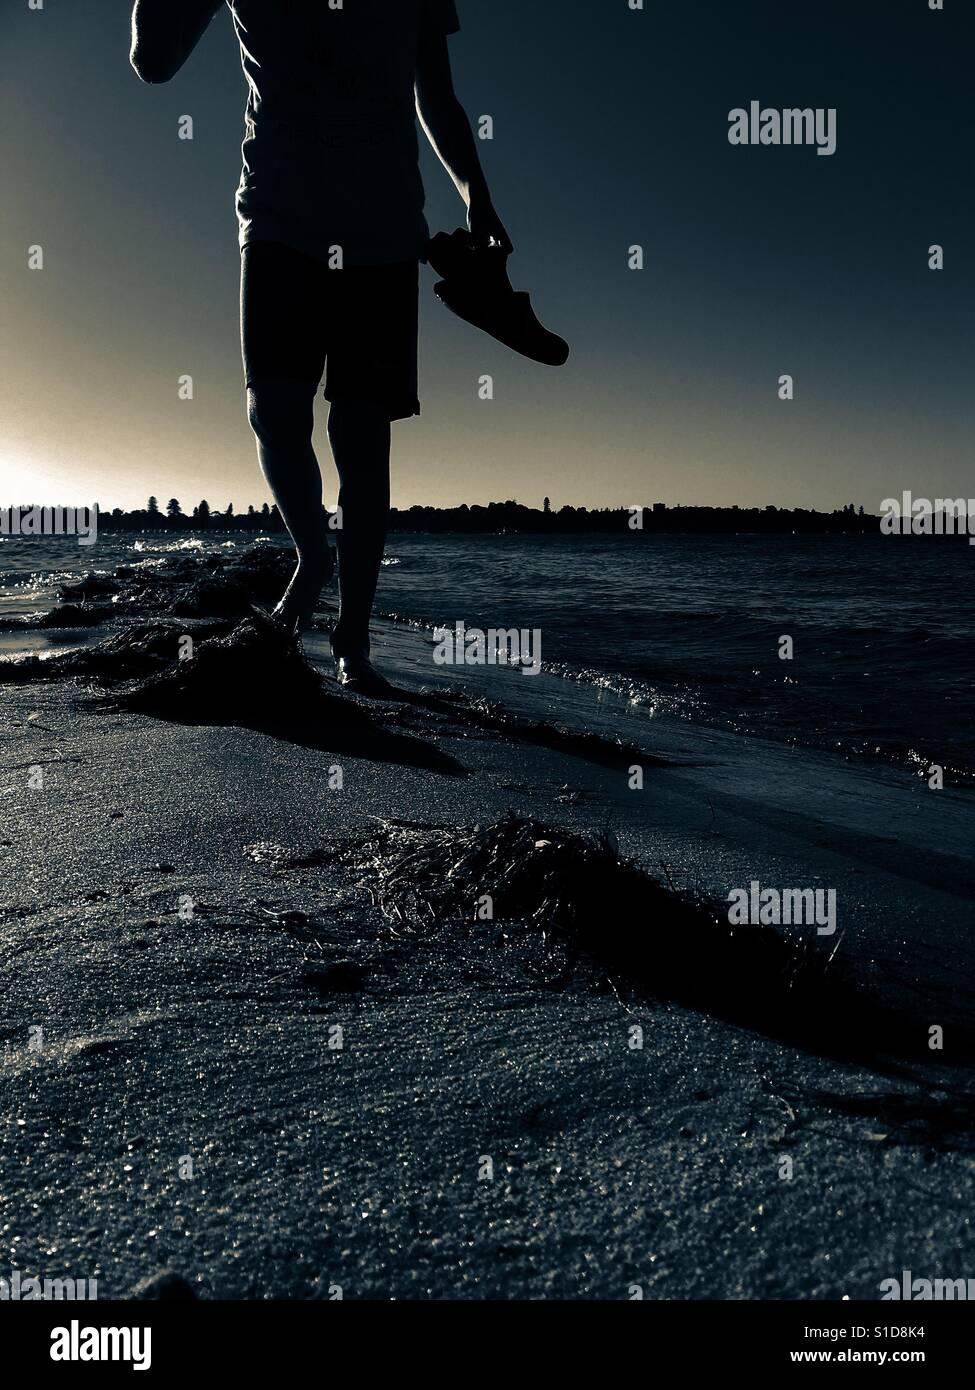 Walker on sandbar at sunset/ sunrise Stock Foto